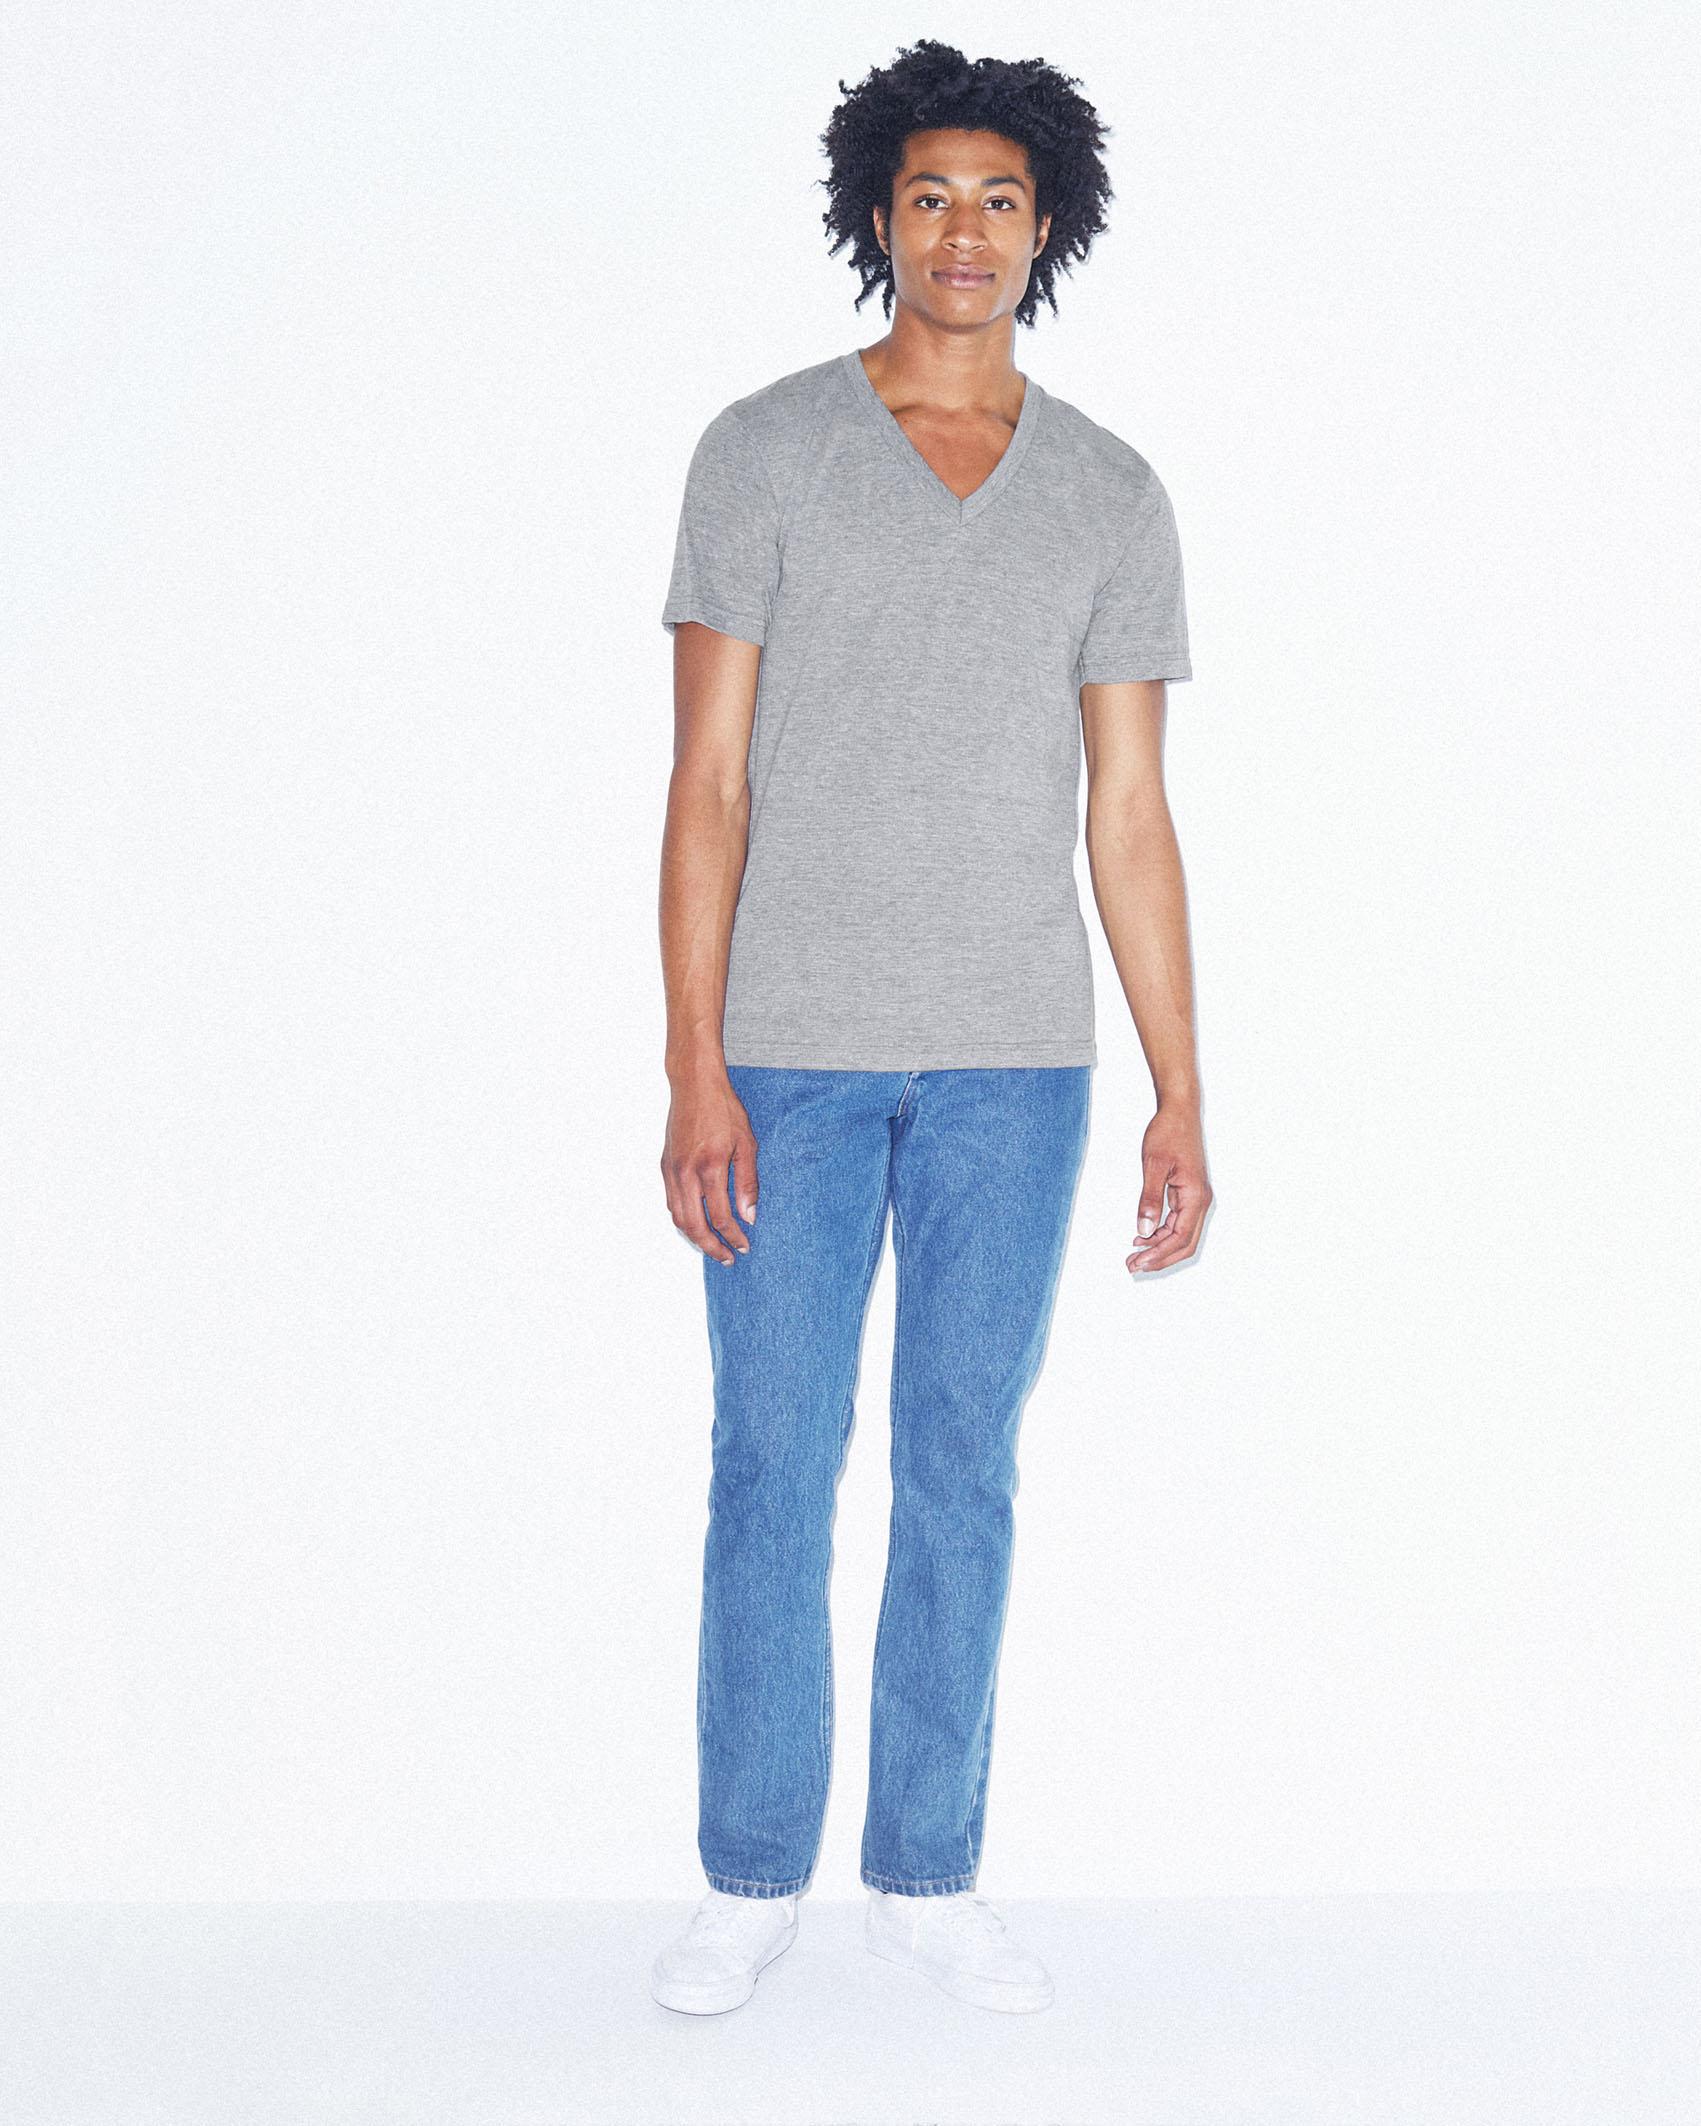 AMA V-Neck T-shirt Tri-Blend Unisex